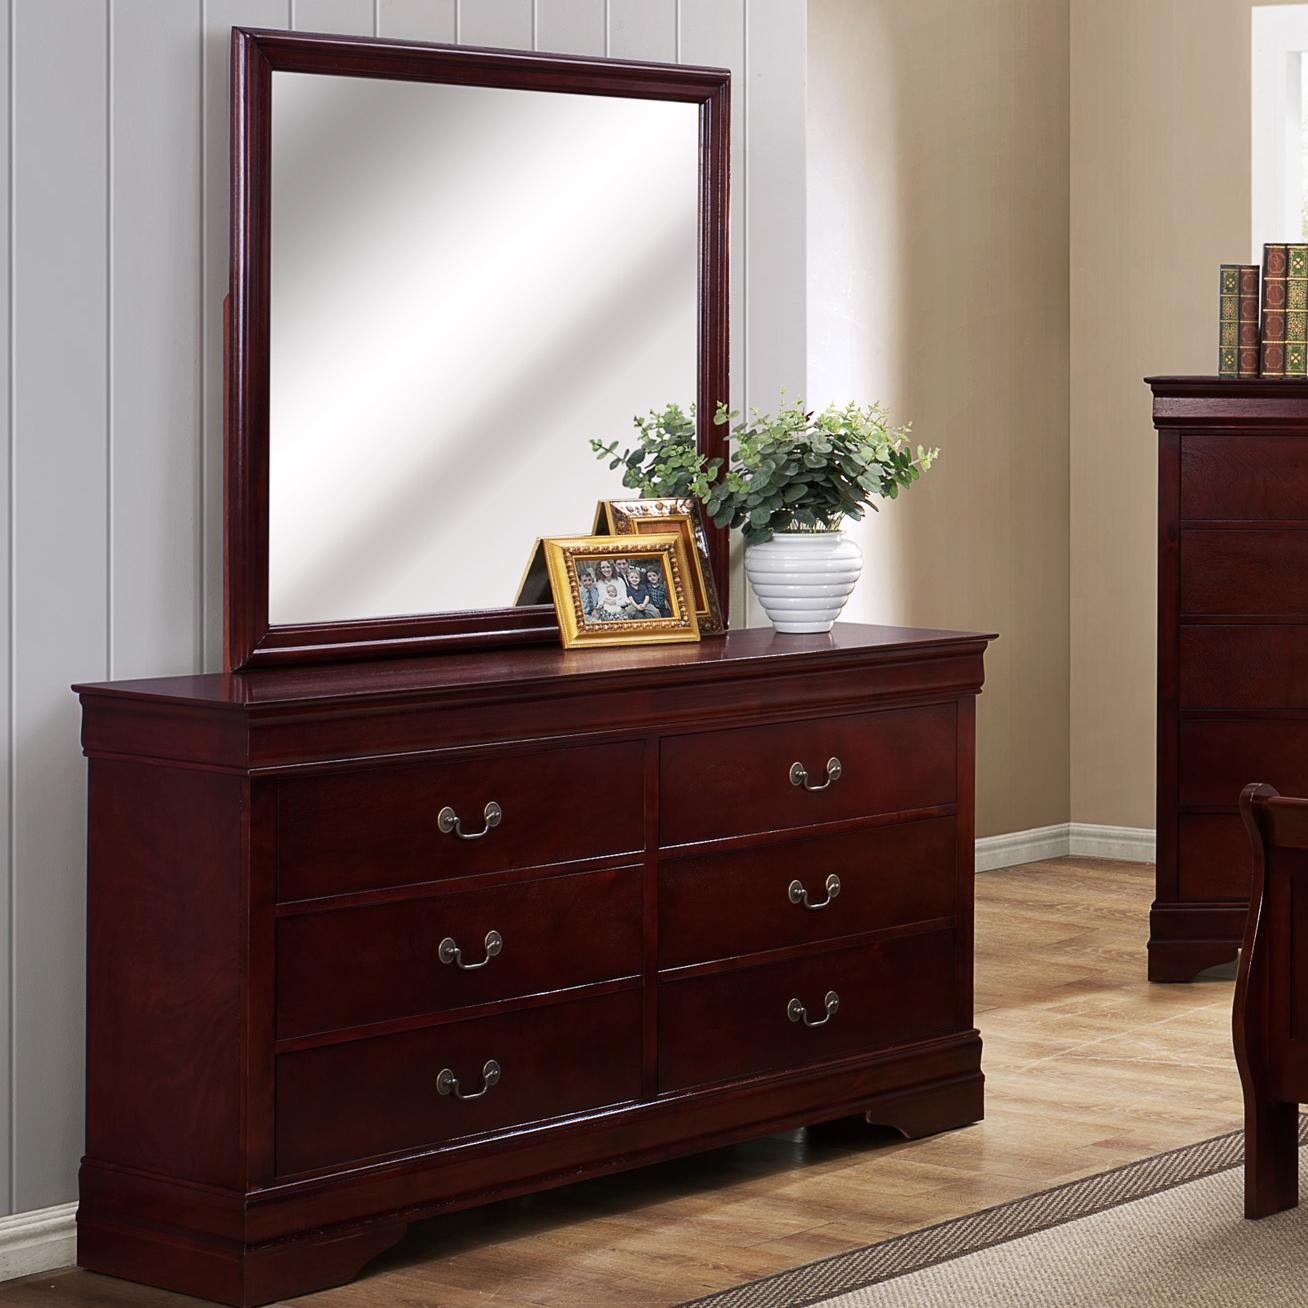 Crown Mark B3800 Louis Phillipe 6 Drawer Dresser with Square Mirror  Dunk  Bright Furniture